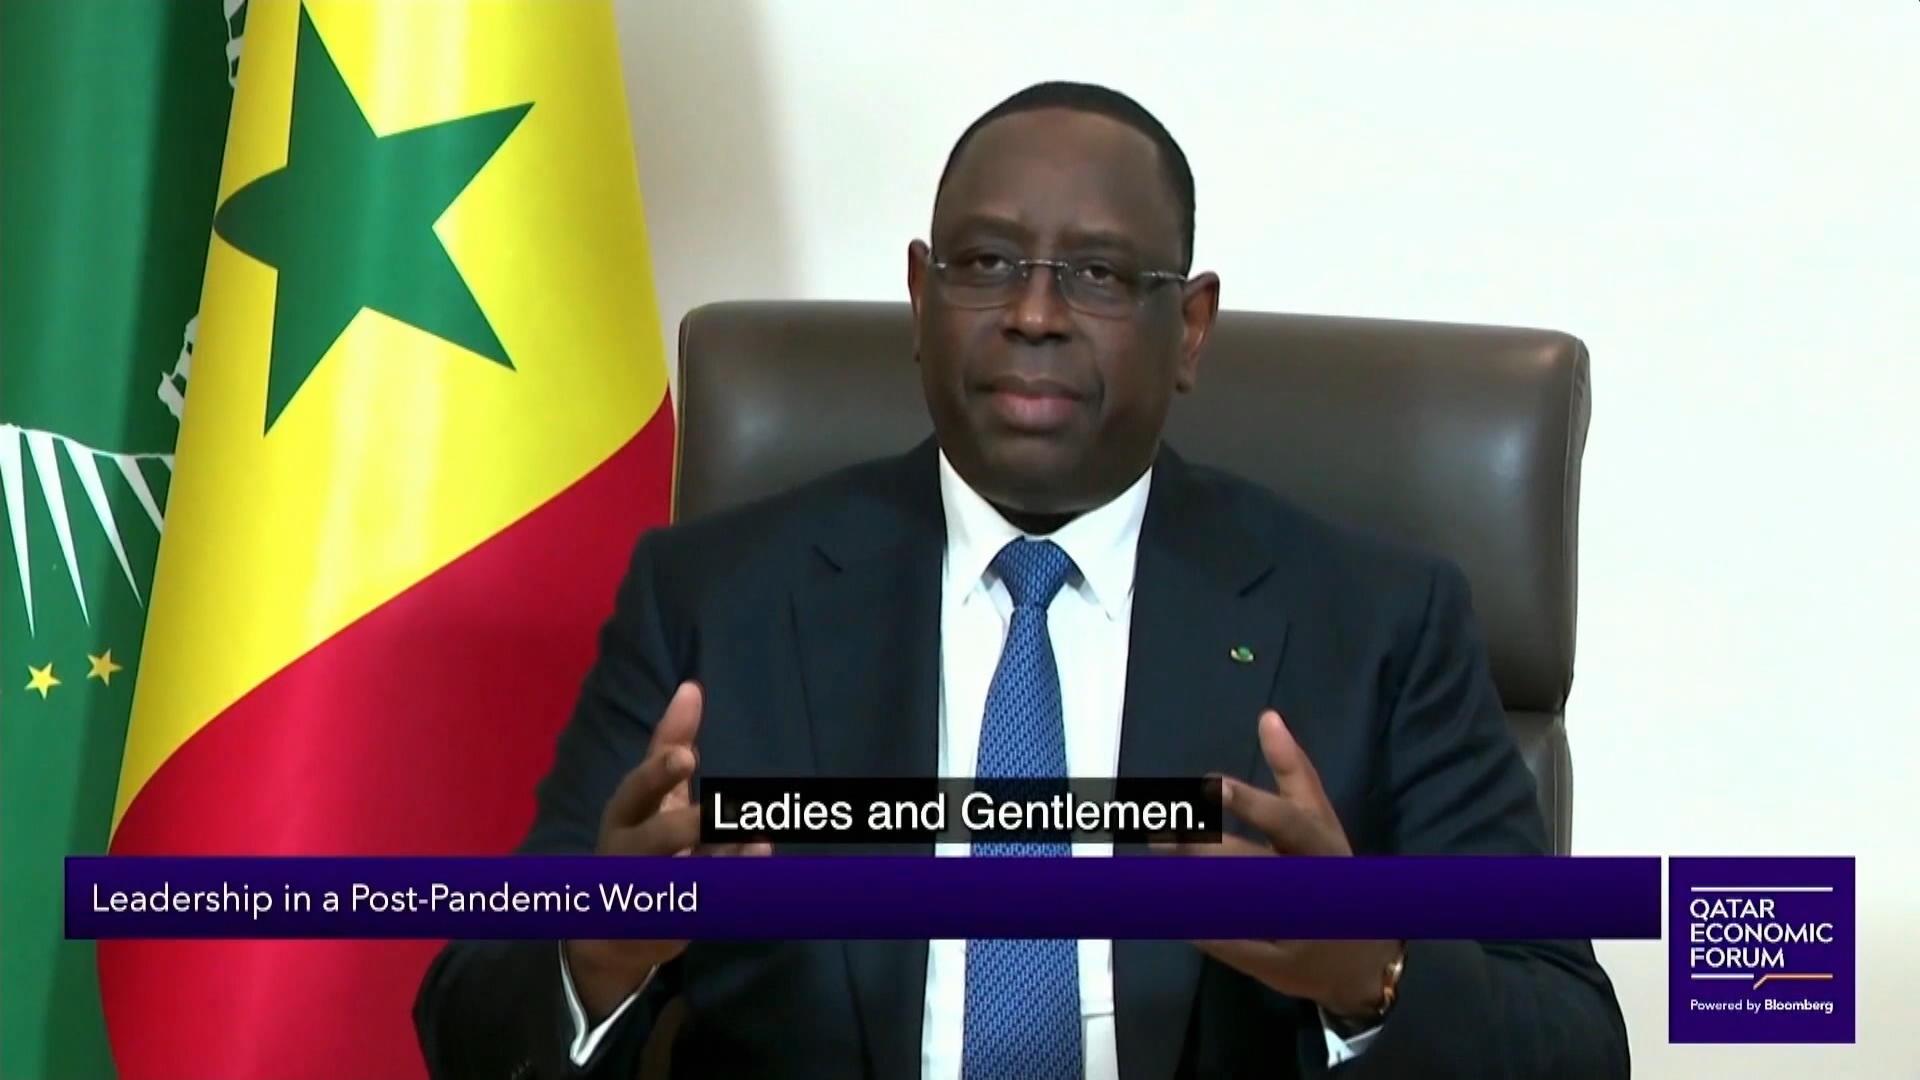 Senegal President Addresses Qatar Economic Forum